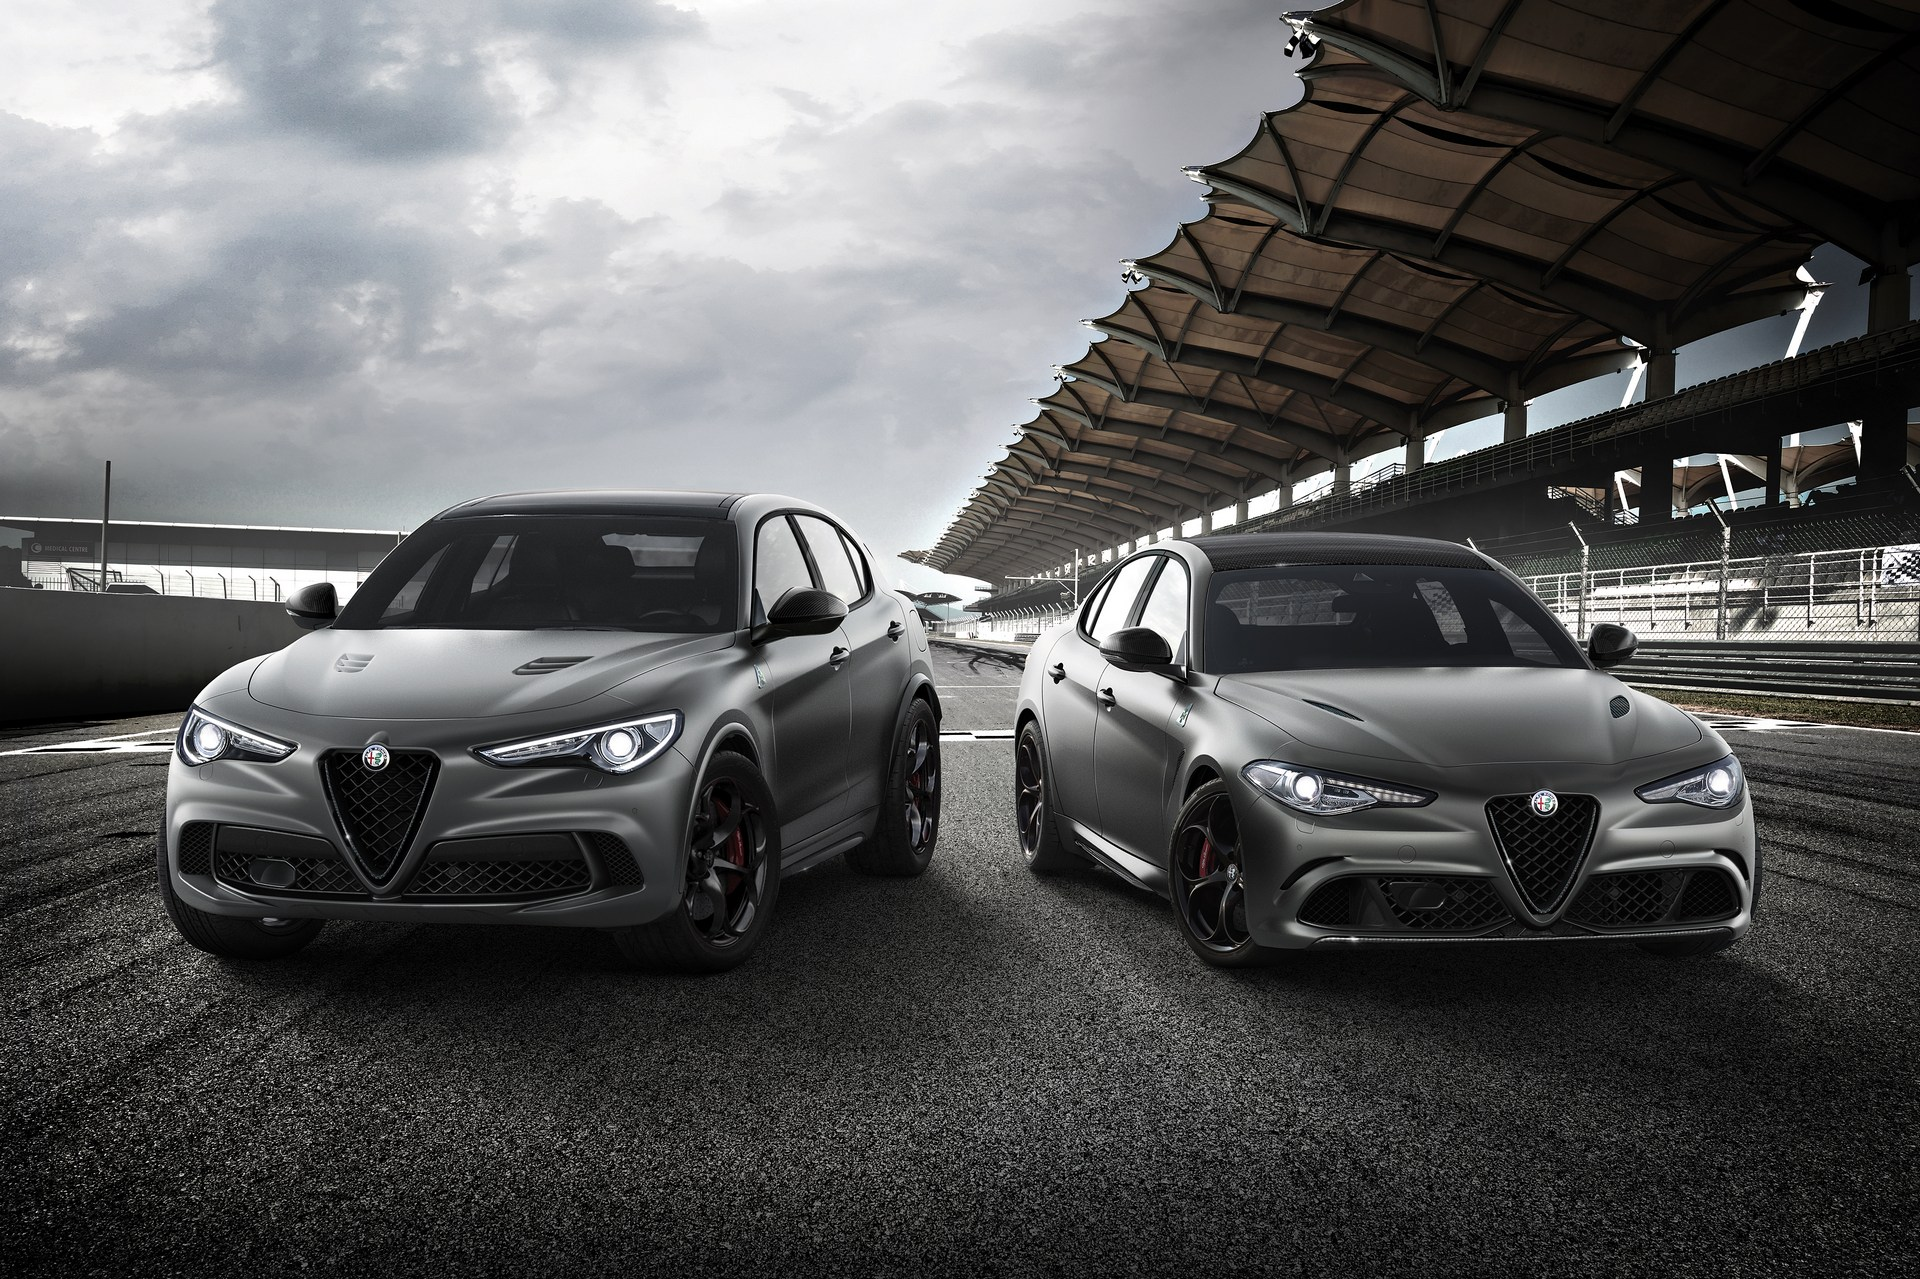 alfa romeo giulia and stelvio nurburgring editions going to geneva